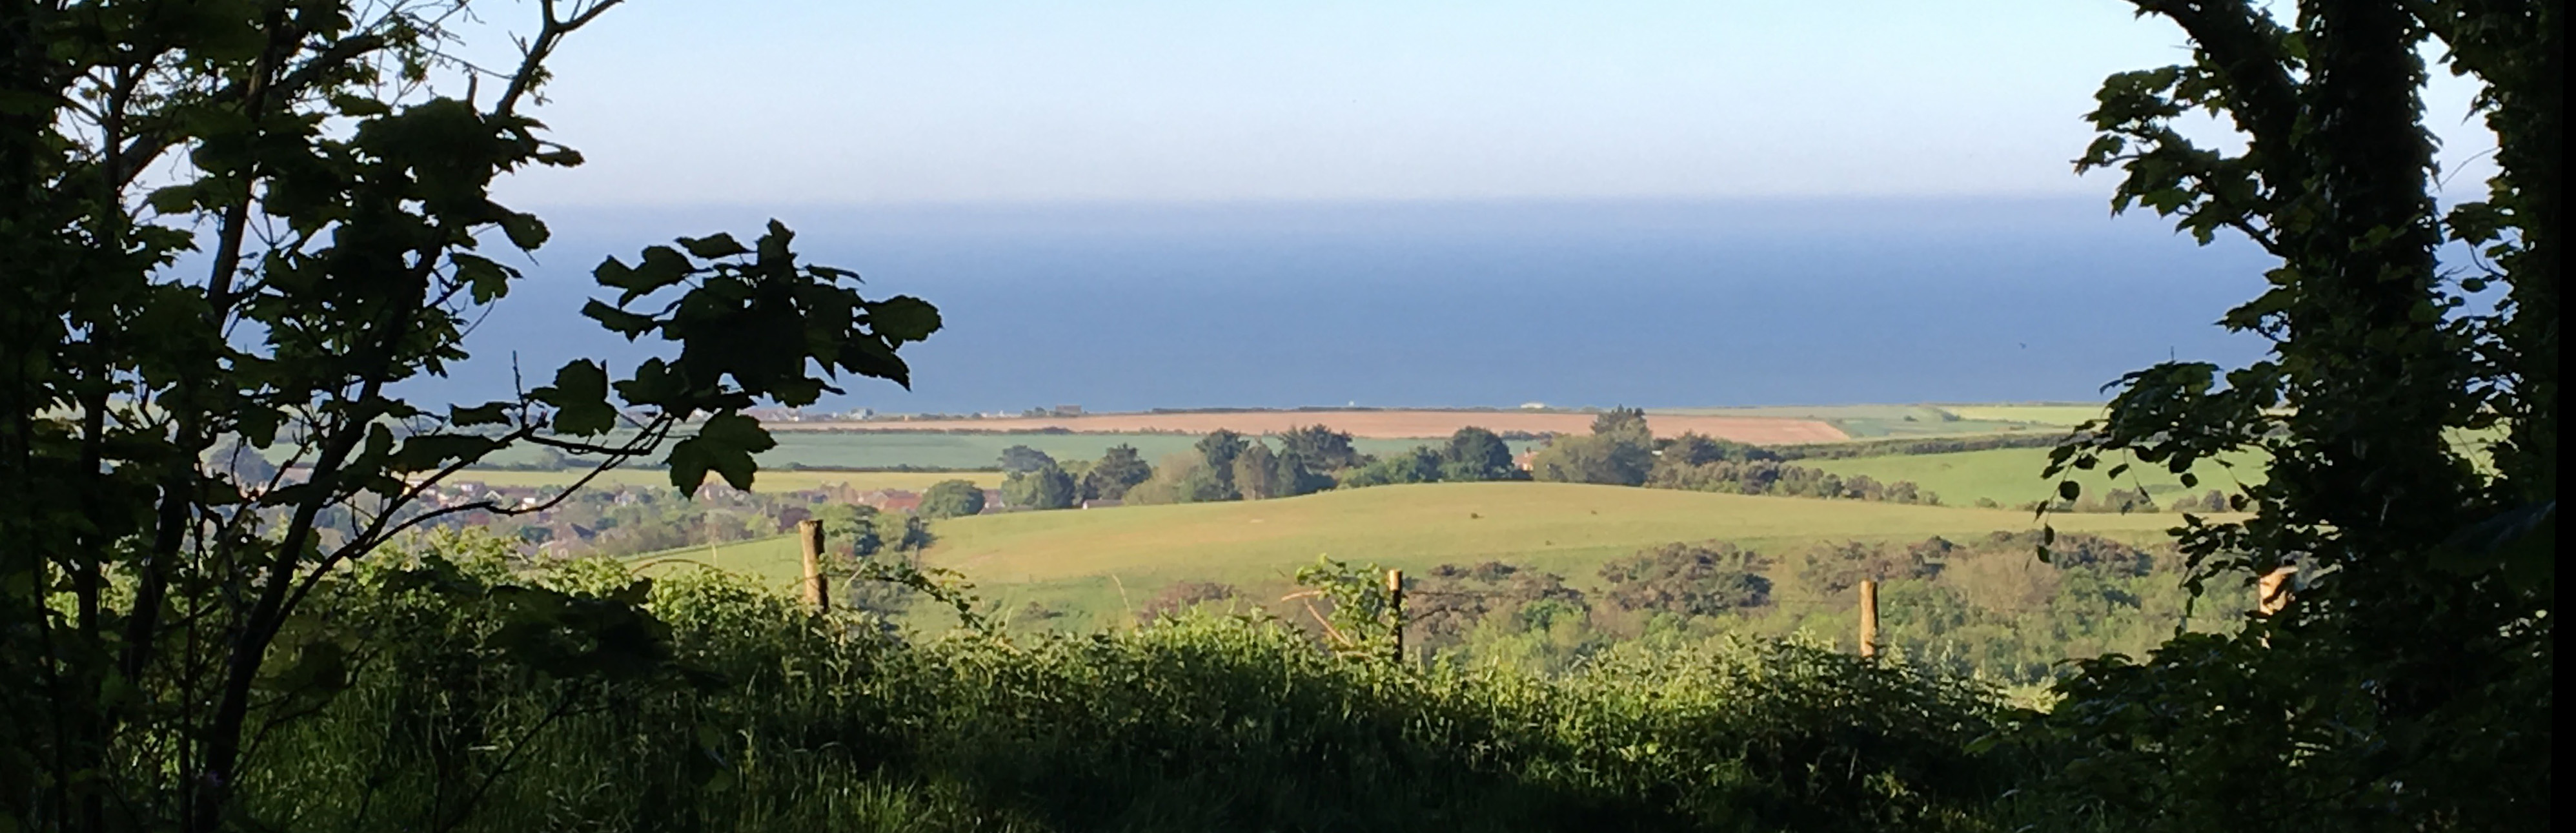 Brighstone view